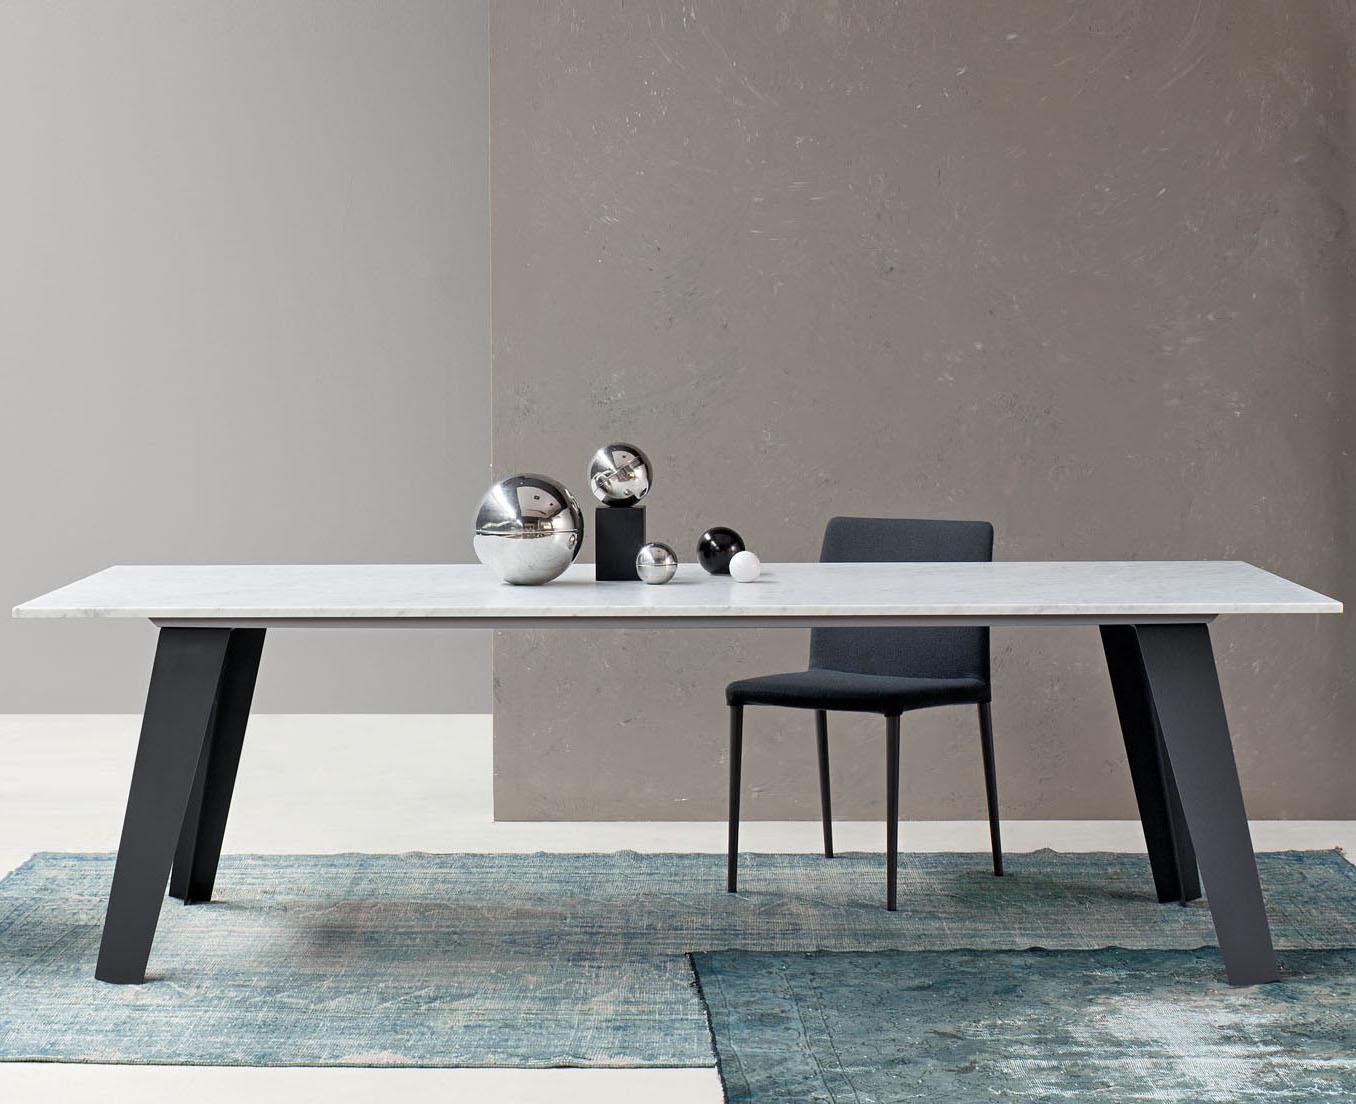 IL Decor Boston: Welded Dining Table, Bonaldo Italy